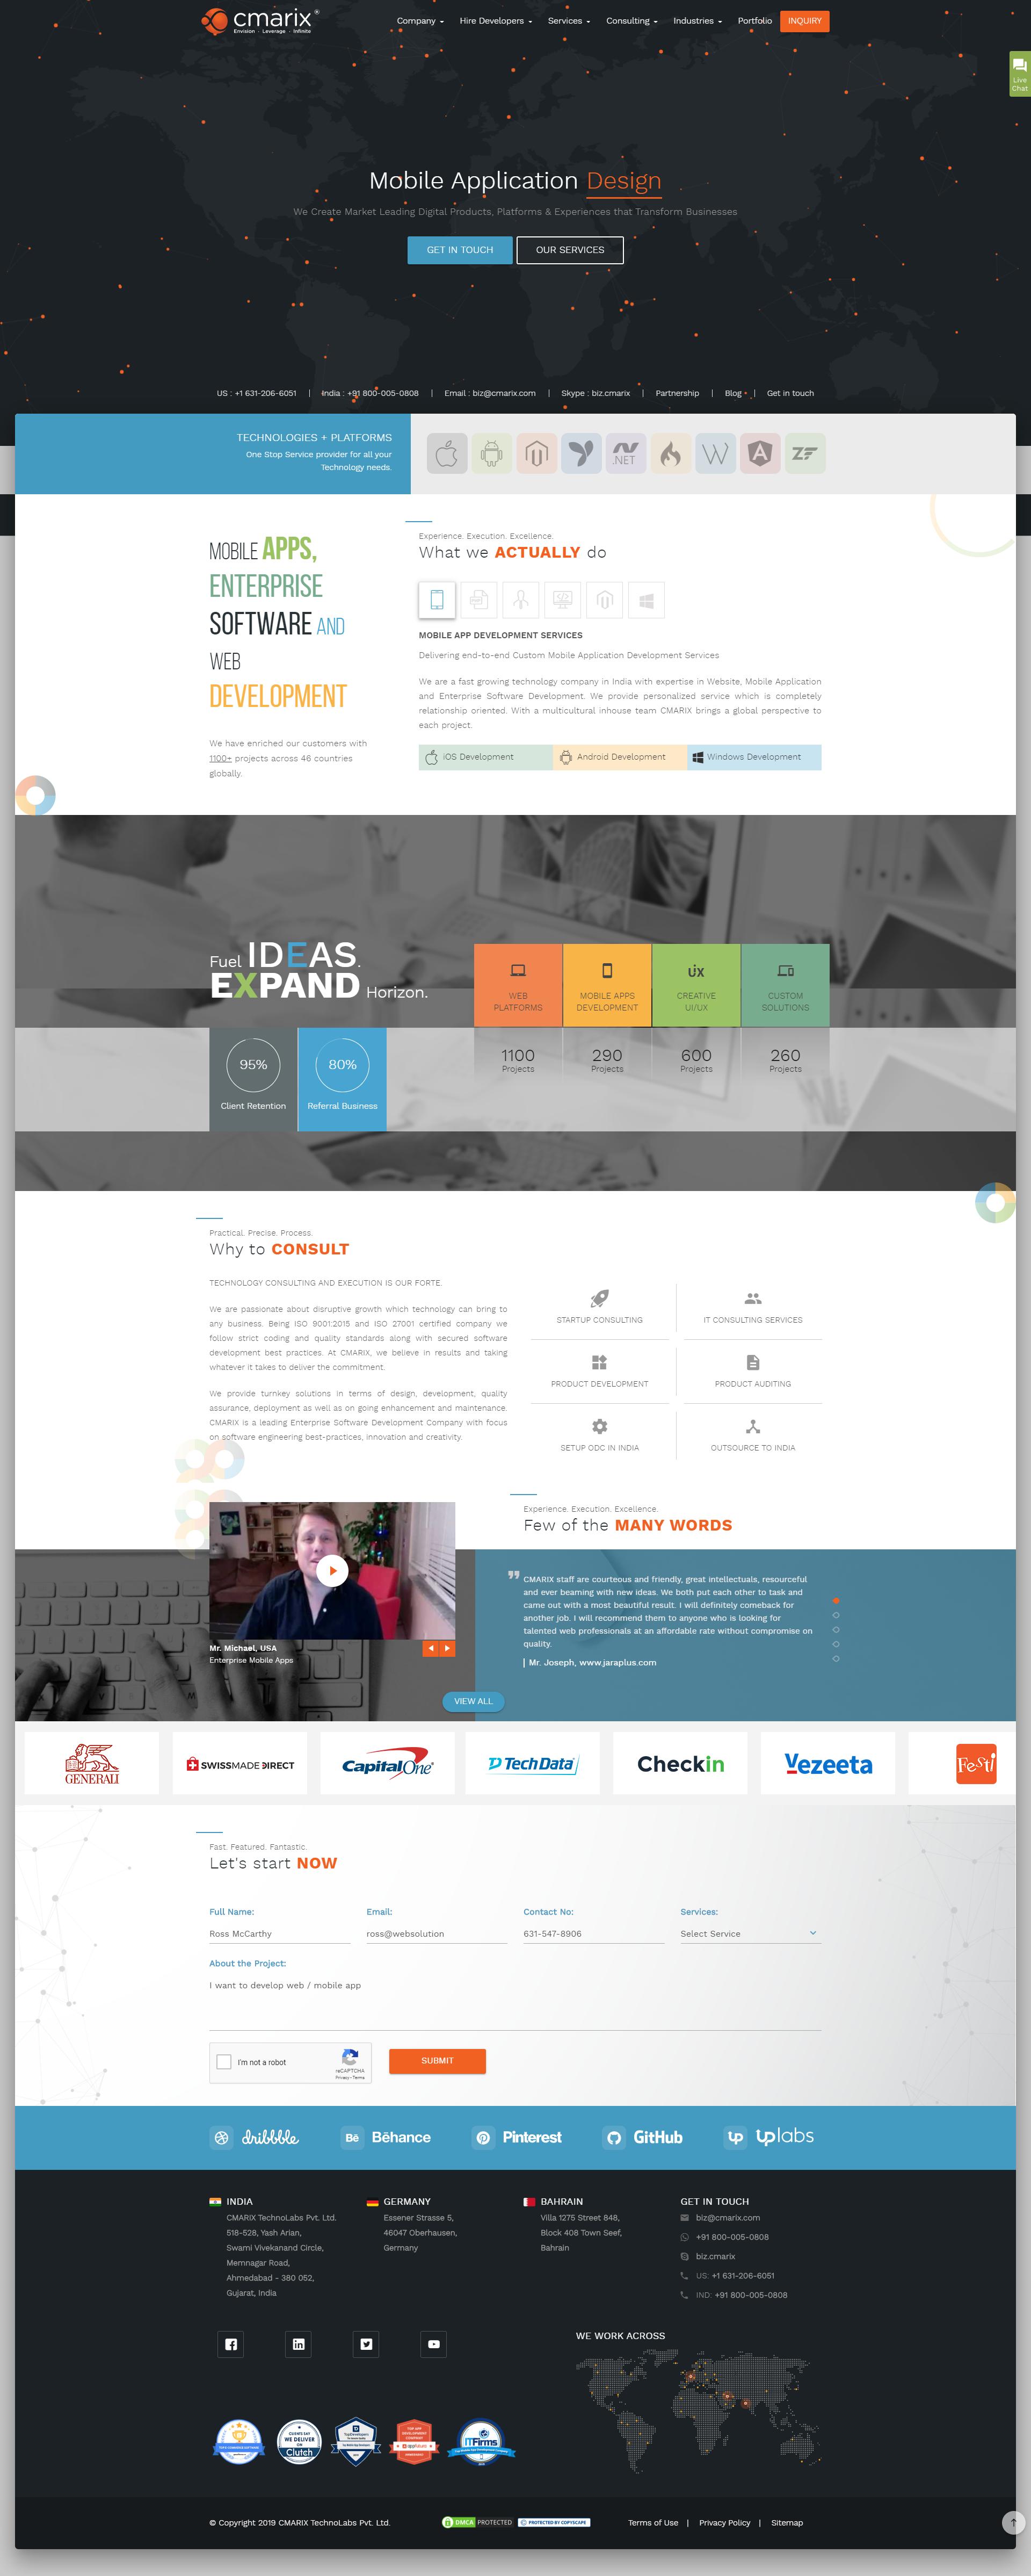 Cmarix Indians Leading Mobile Apps Custom Software Websites Development Company Website Beautiful Website Design Website Design Personal Website Design